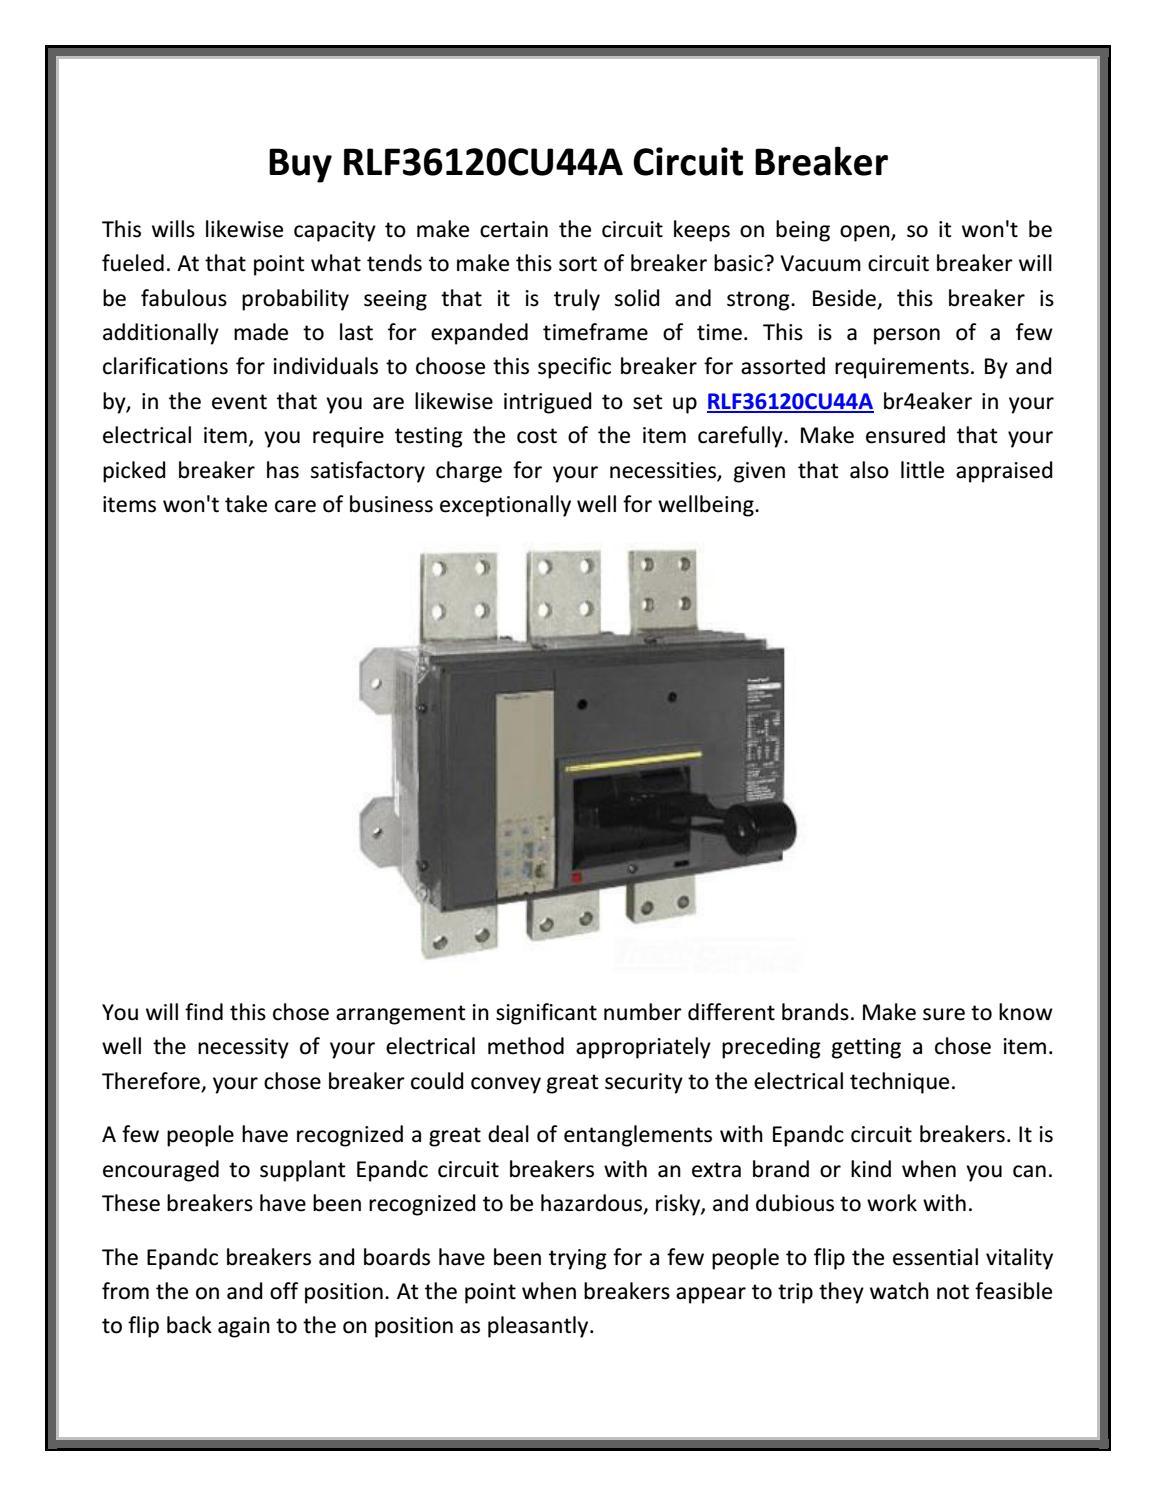 Buy Rlf36120cu44a Circuit Breaker By Epandc Issuu How Does Work